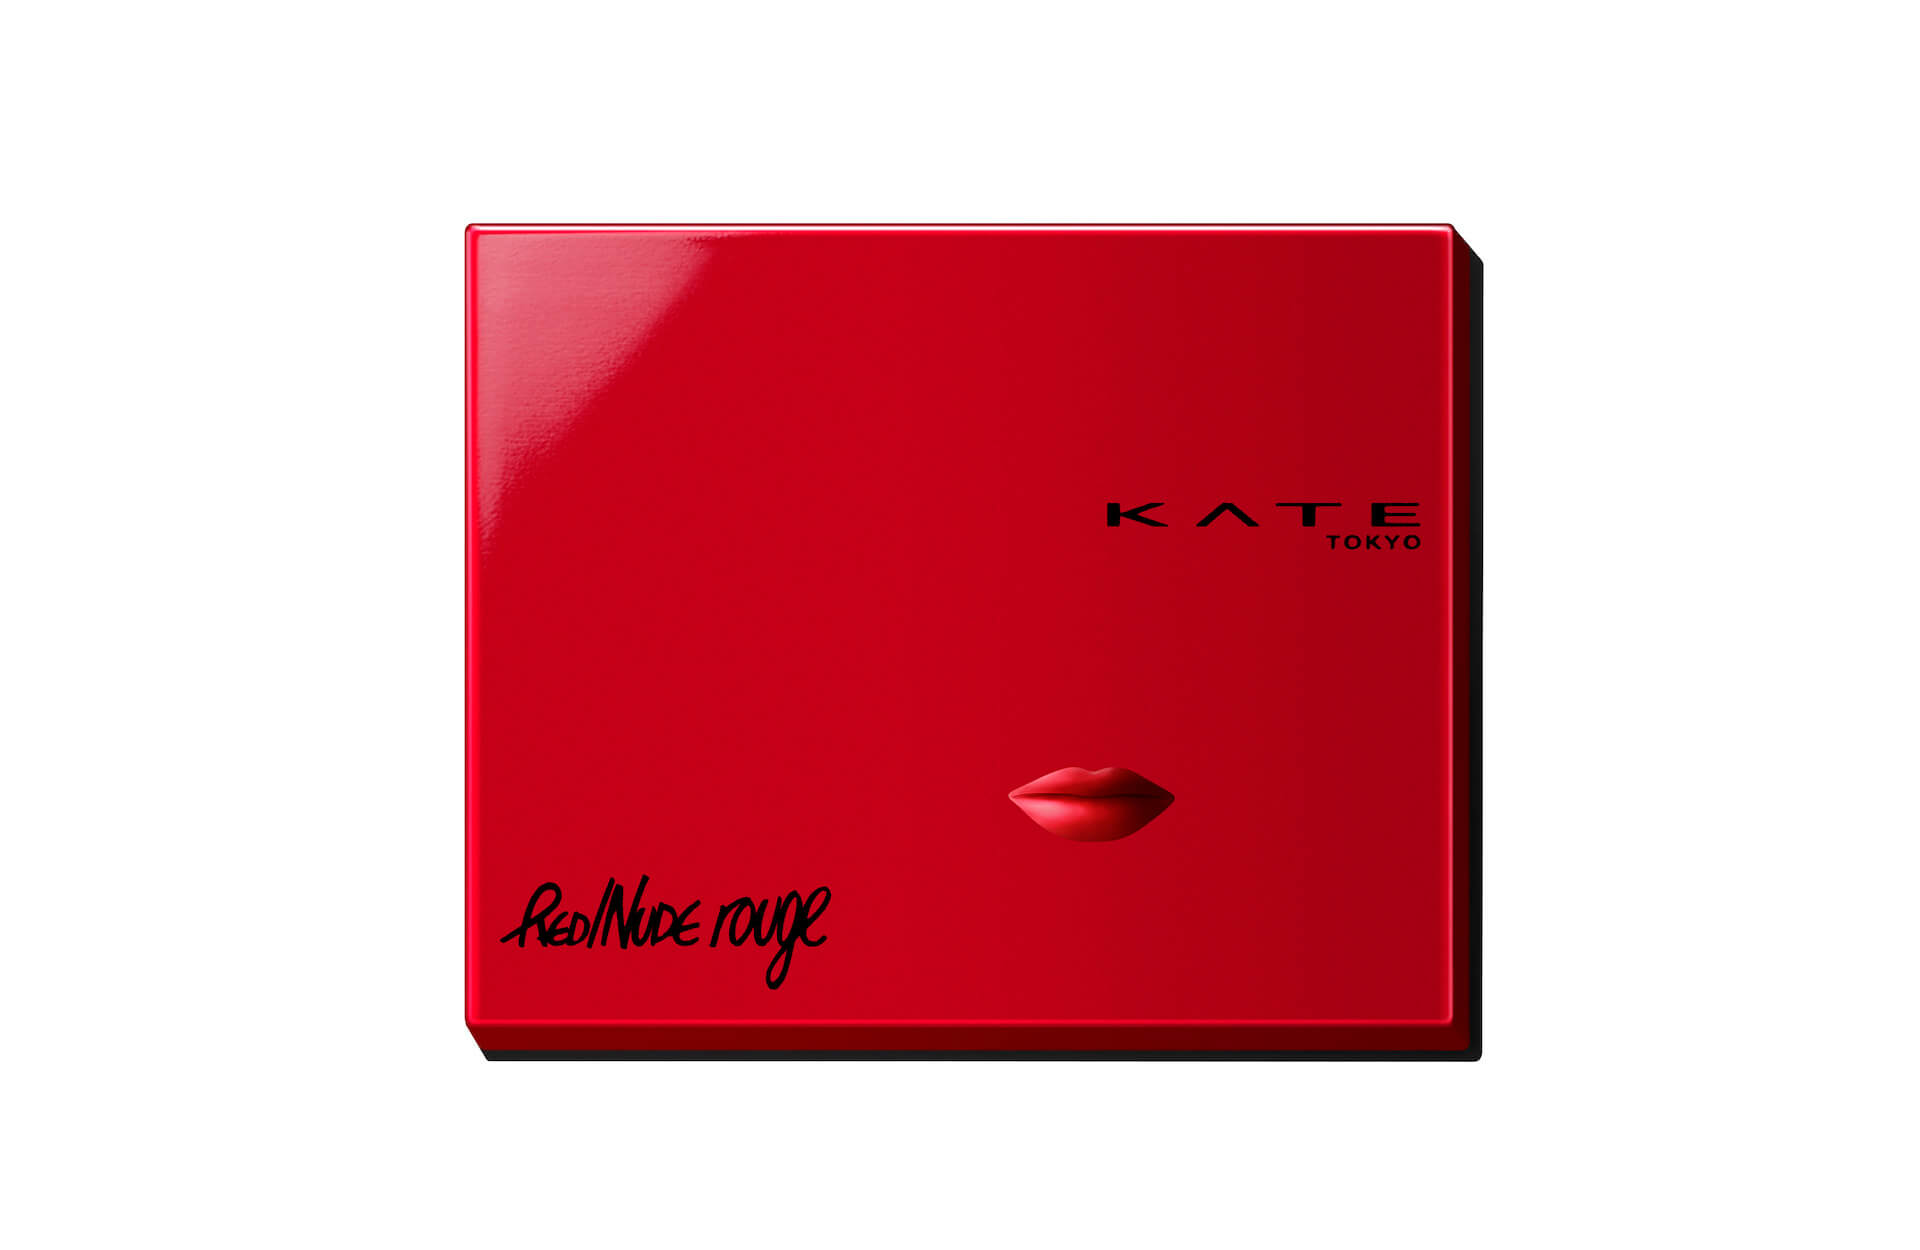 KATEが『エヴァンゲリオン』とコラボ!見たことのない綾波レイの姿が描かれた限定パッケージ発売決定 art201008_eva_kate_4